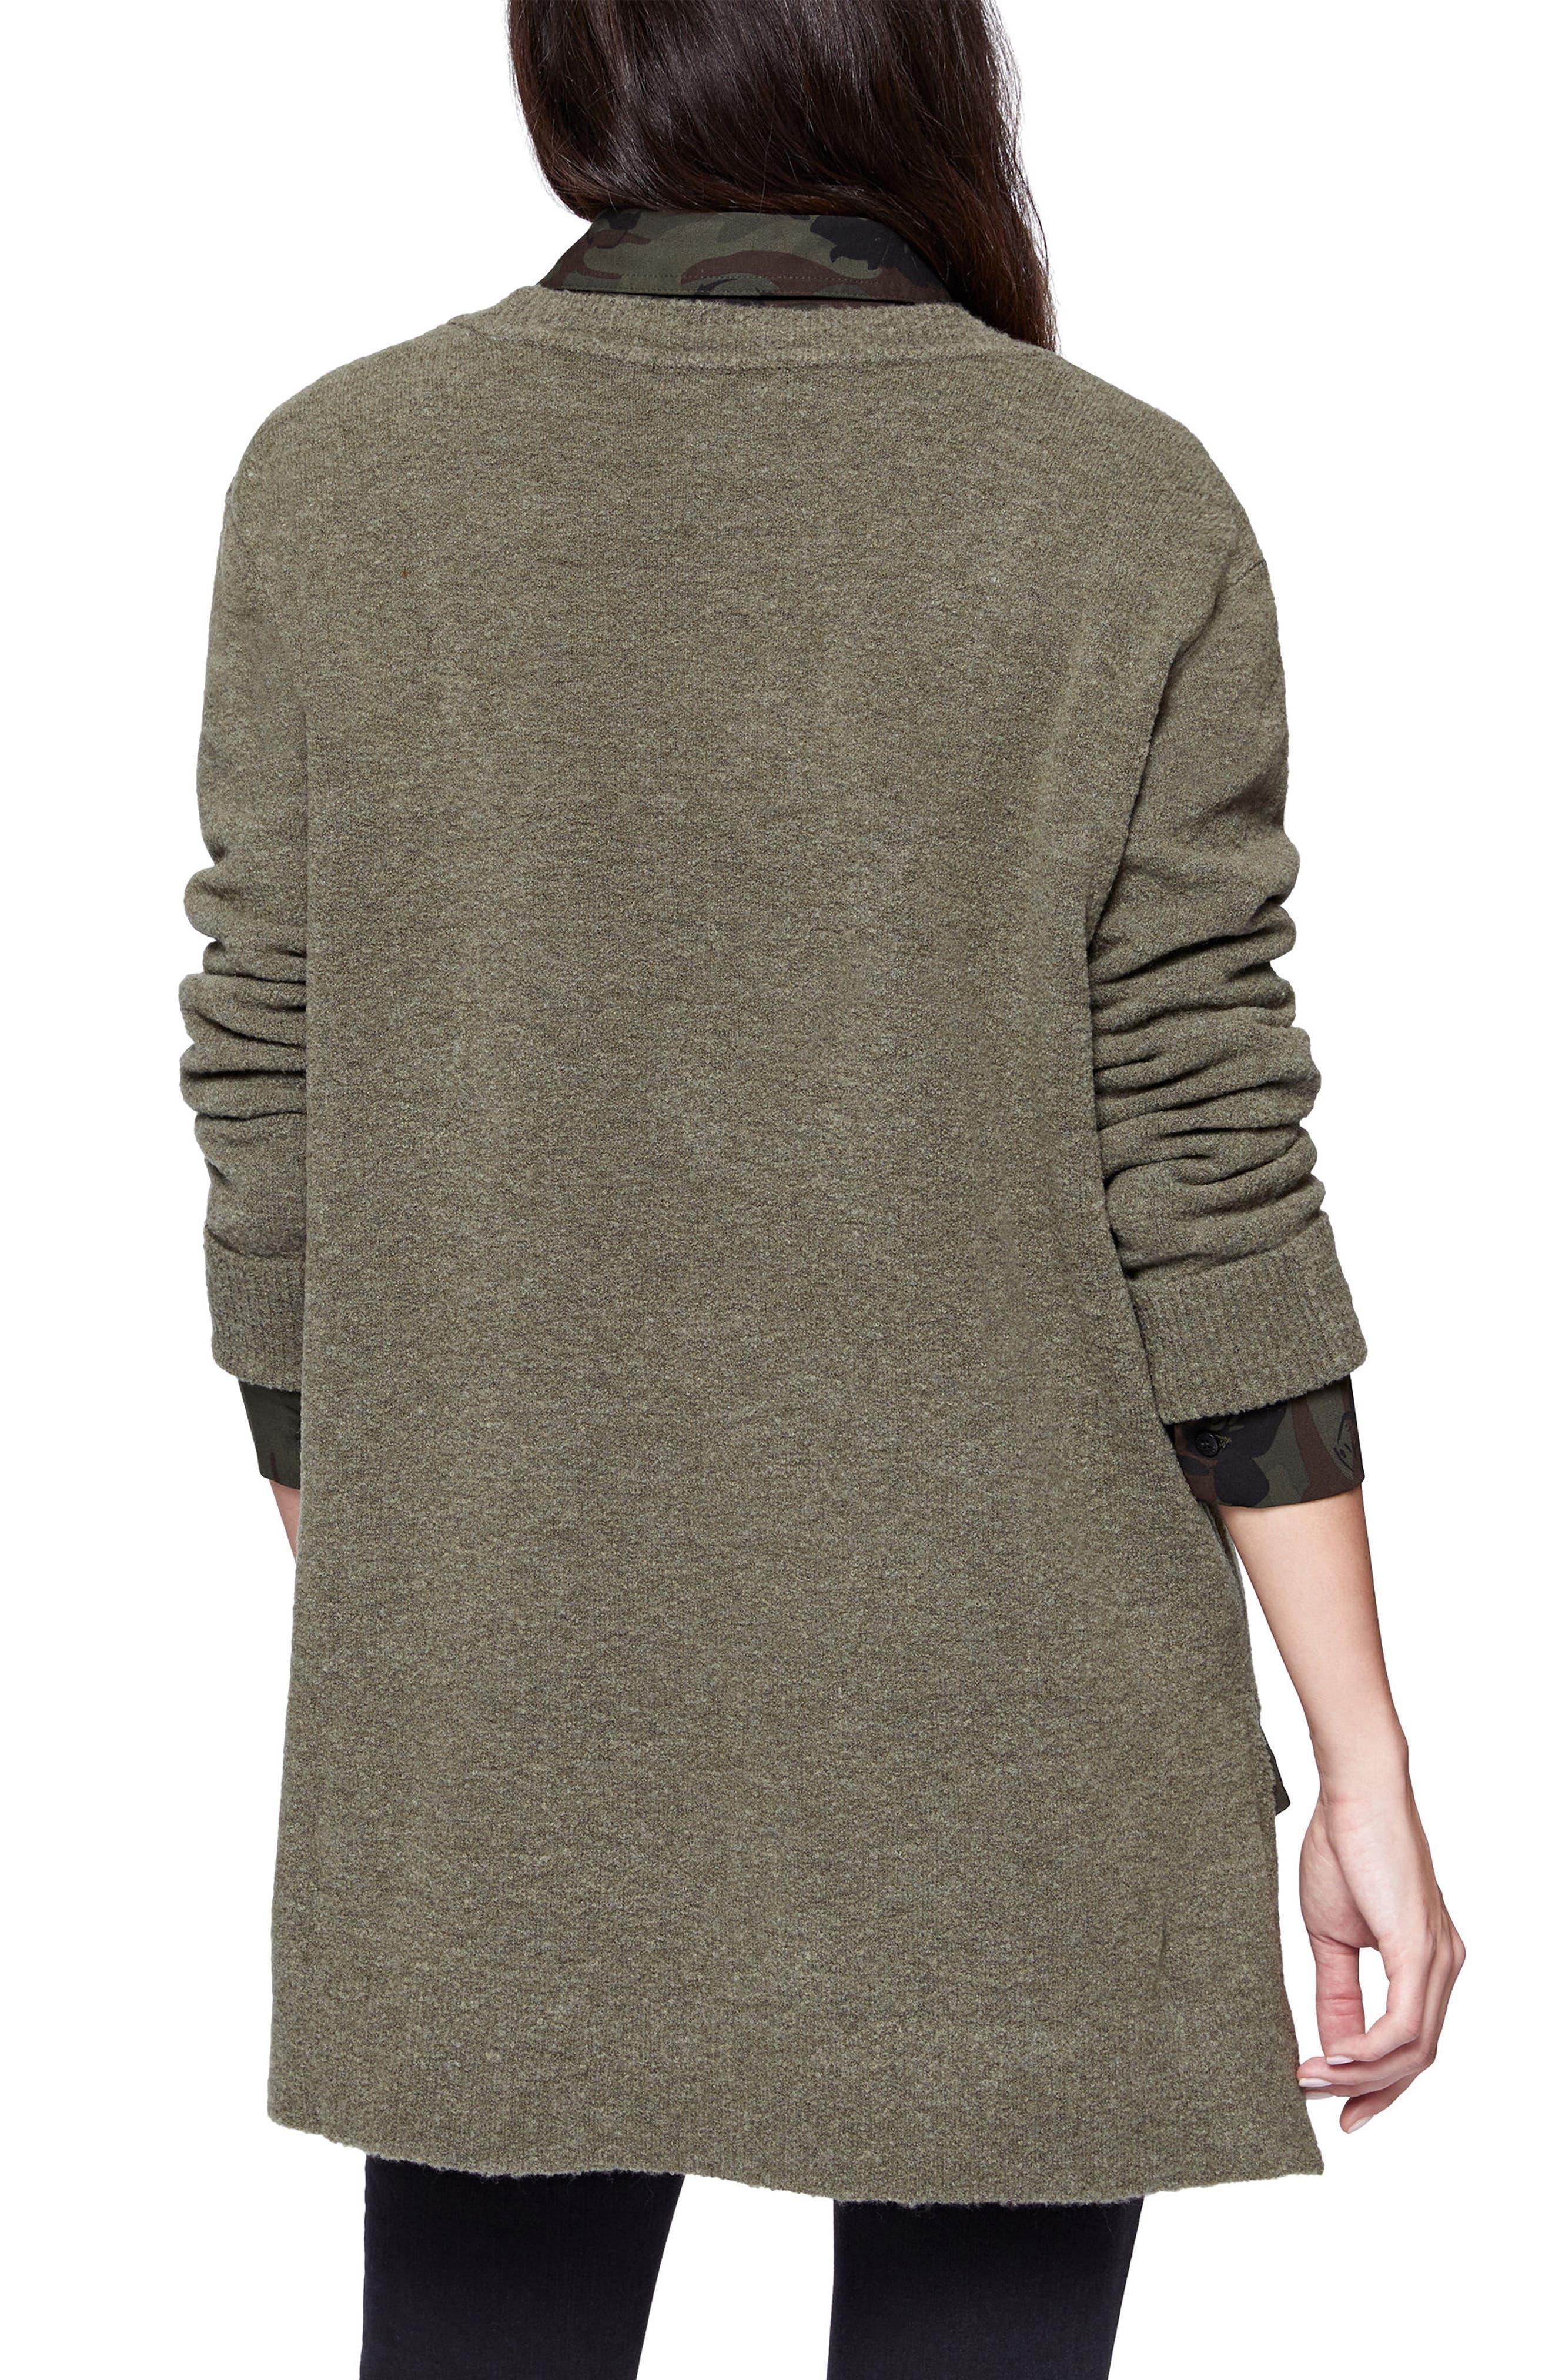 Santuary Delancey V-Neck Sweater,                             Alternate thumbnail 5, color,